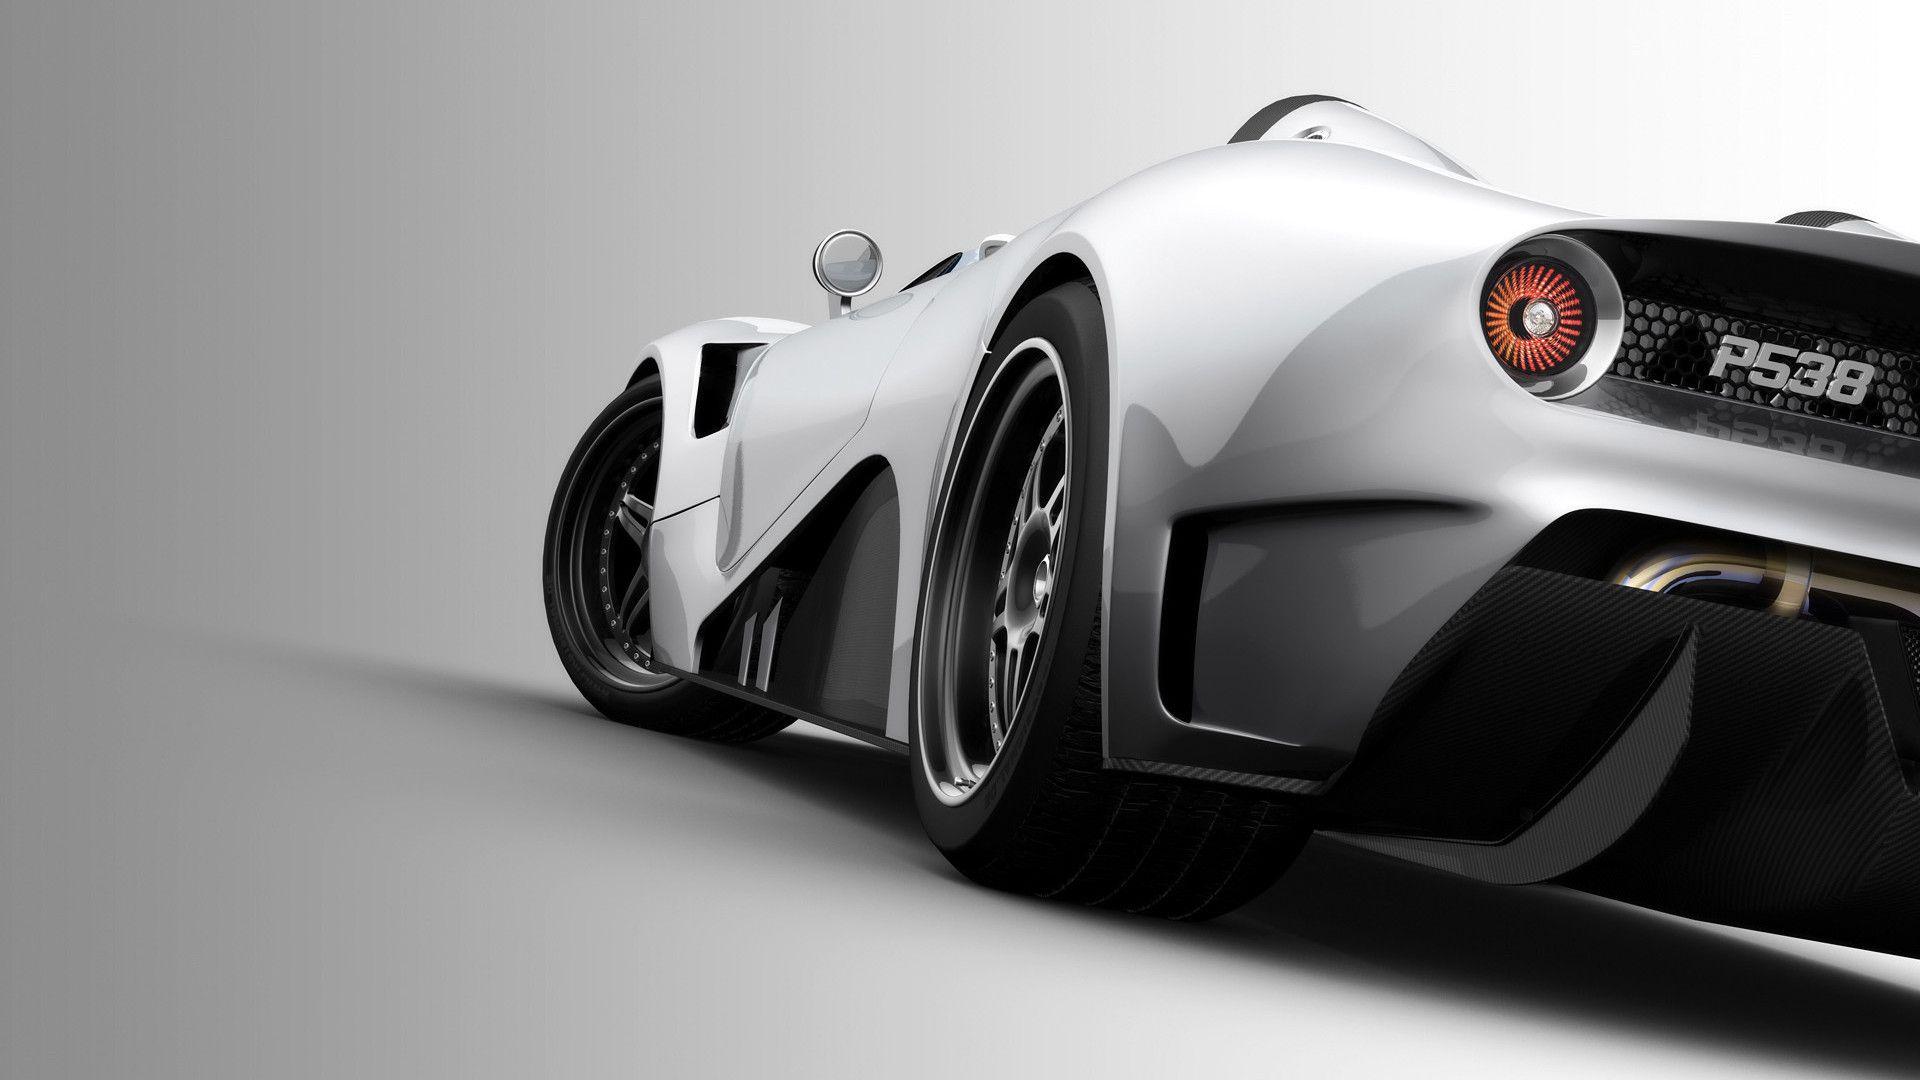 Awesome Car Wallpaper Backgrounds Full Hd Backgrounds 1080p Cars Pixelstalk Net